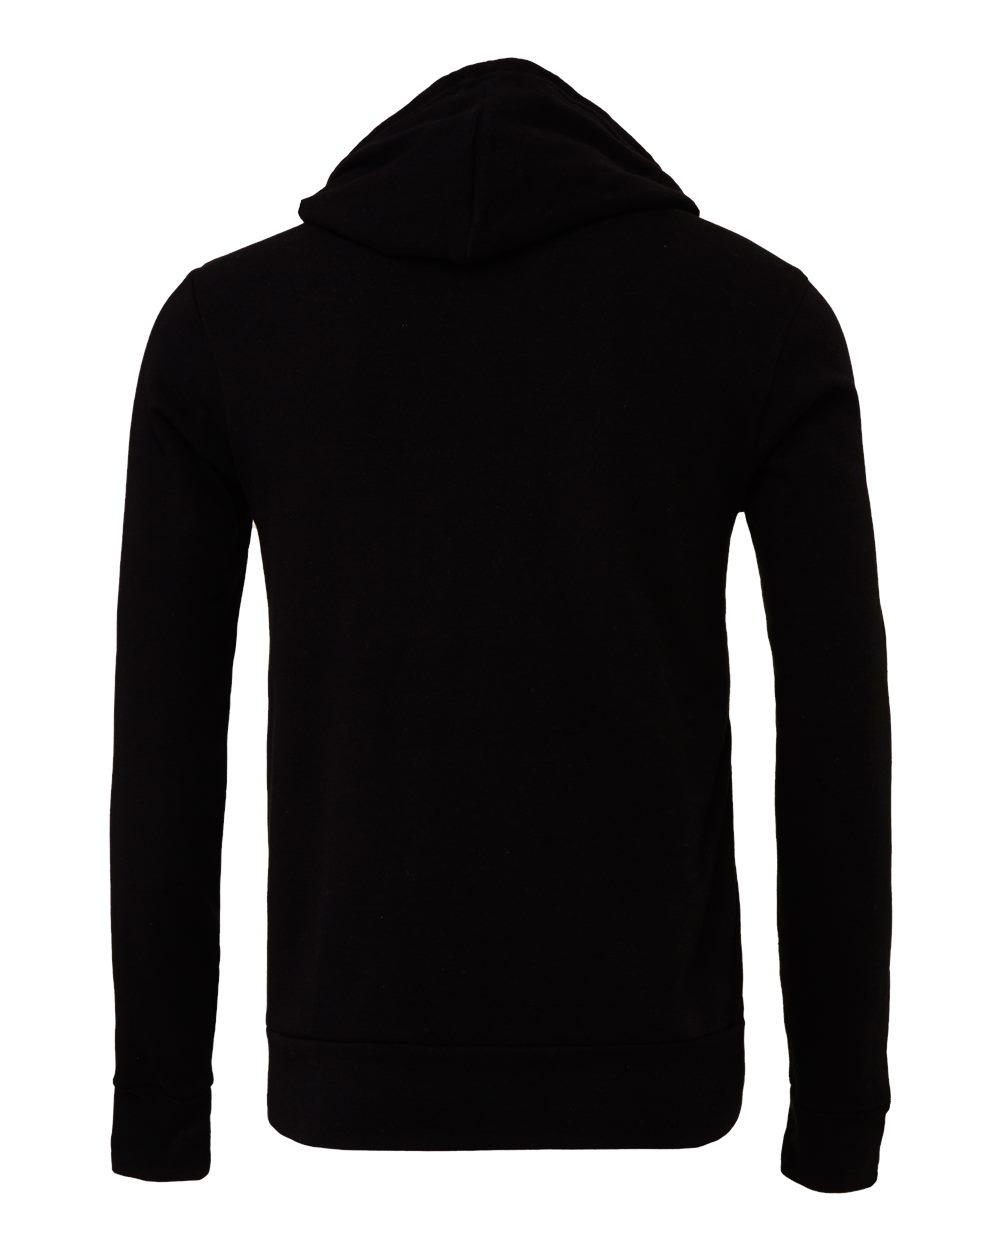 Bella-Canvas-Unisex-Sponge-Hooded-Pullover-Sweatshirt-Blank-3719-up-to-2XL thumbnail 12